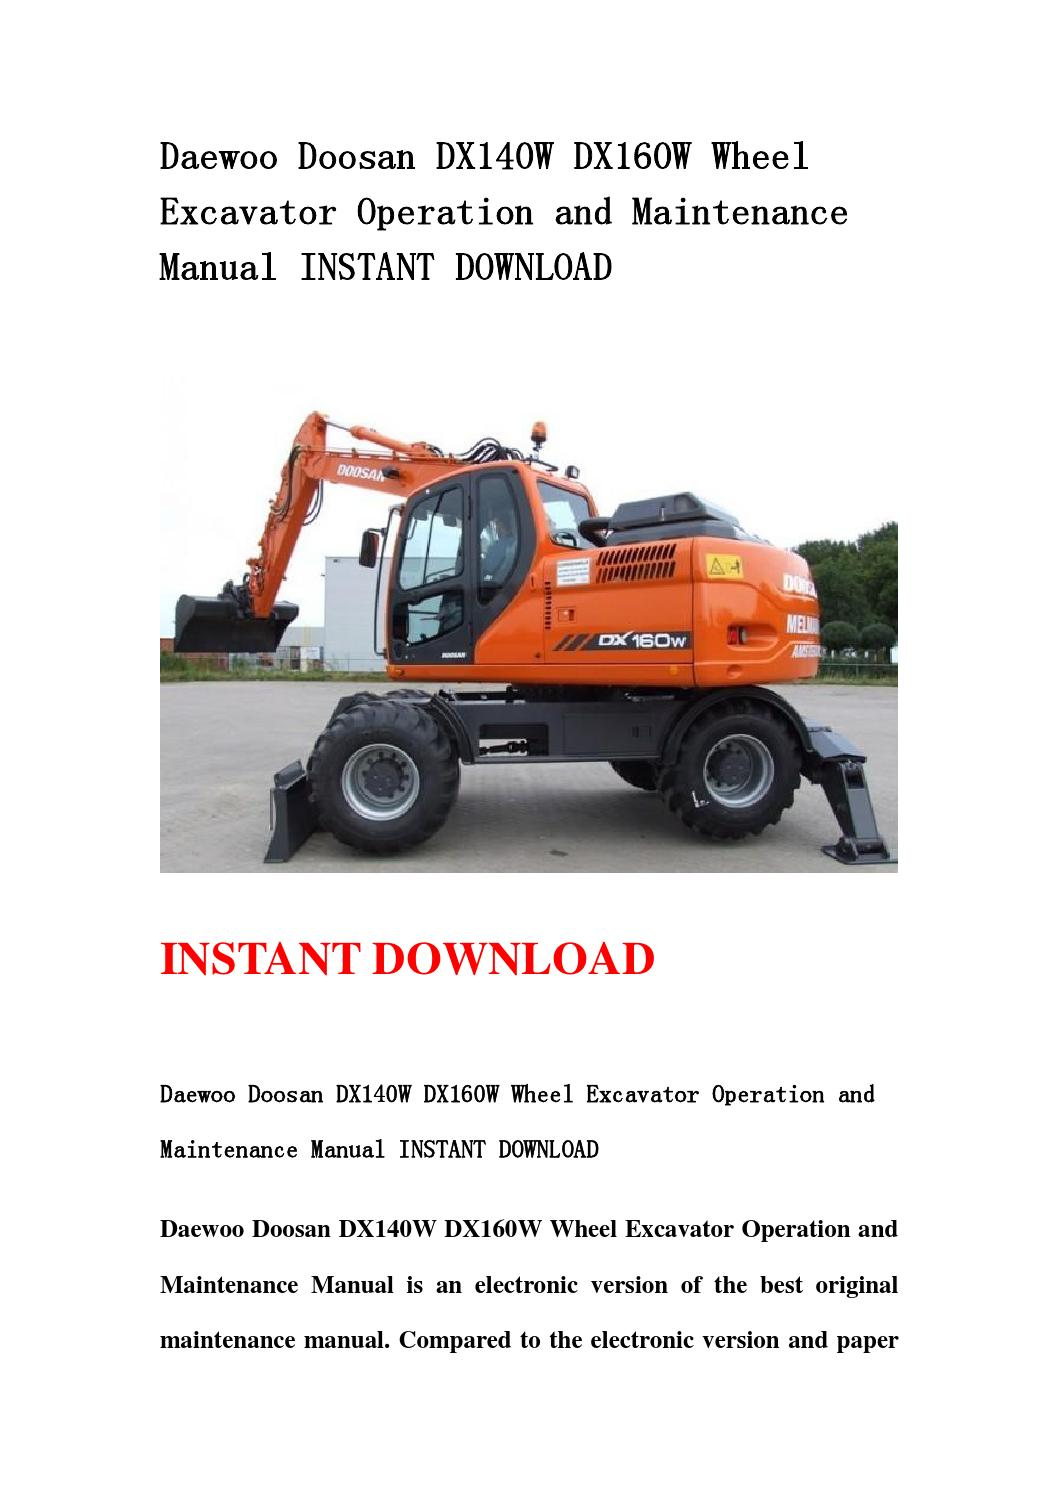 daewoo doosan dx140w dx160w wheel excavator operation and maintenance manual instant download